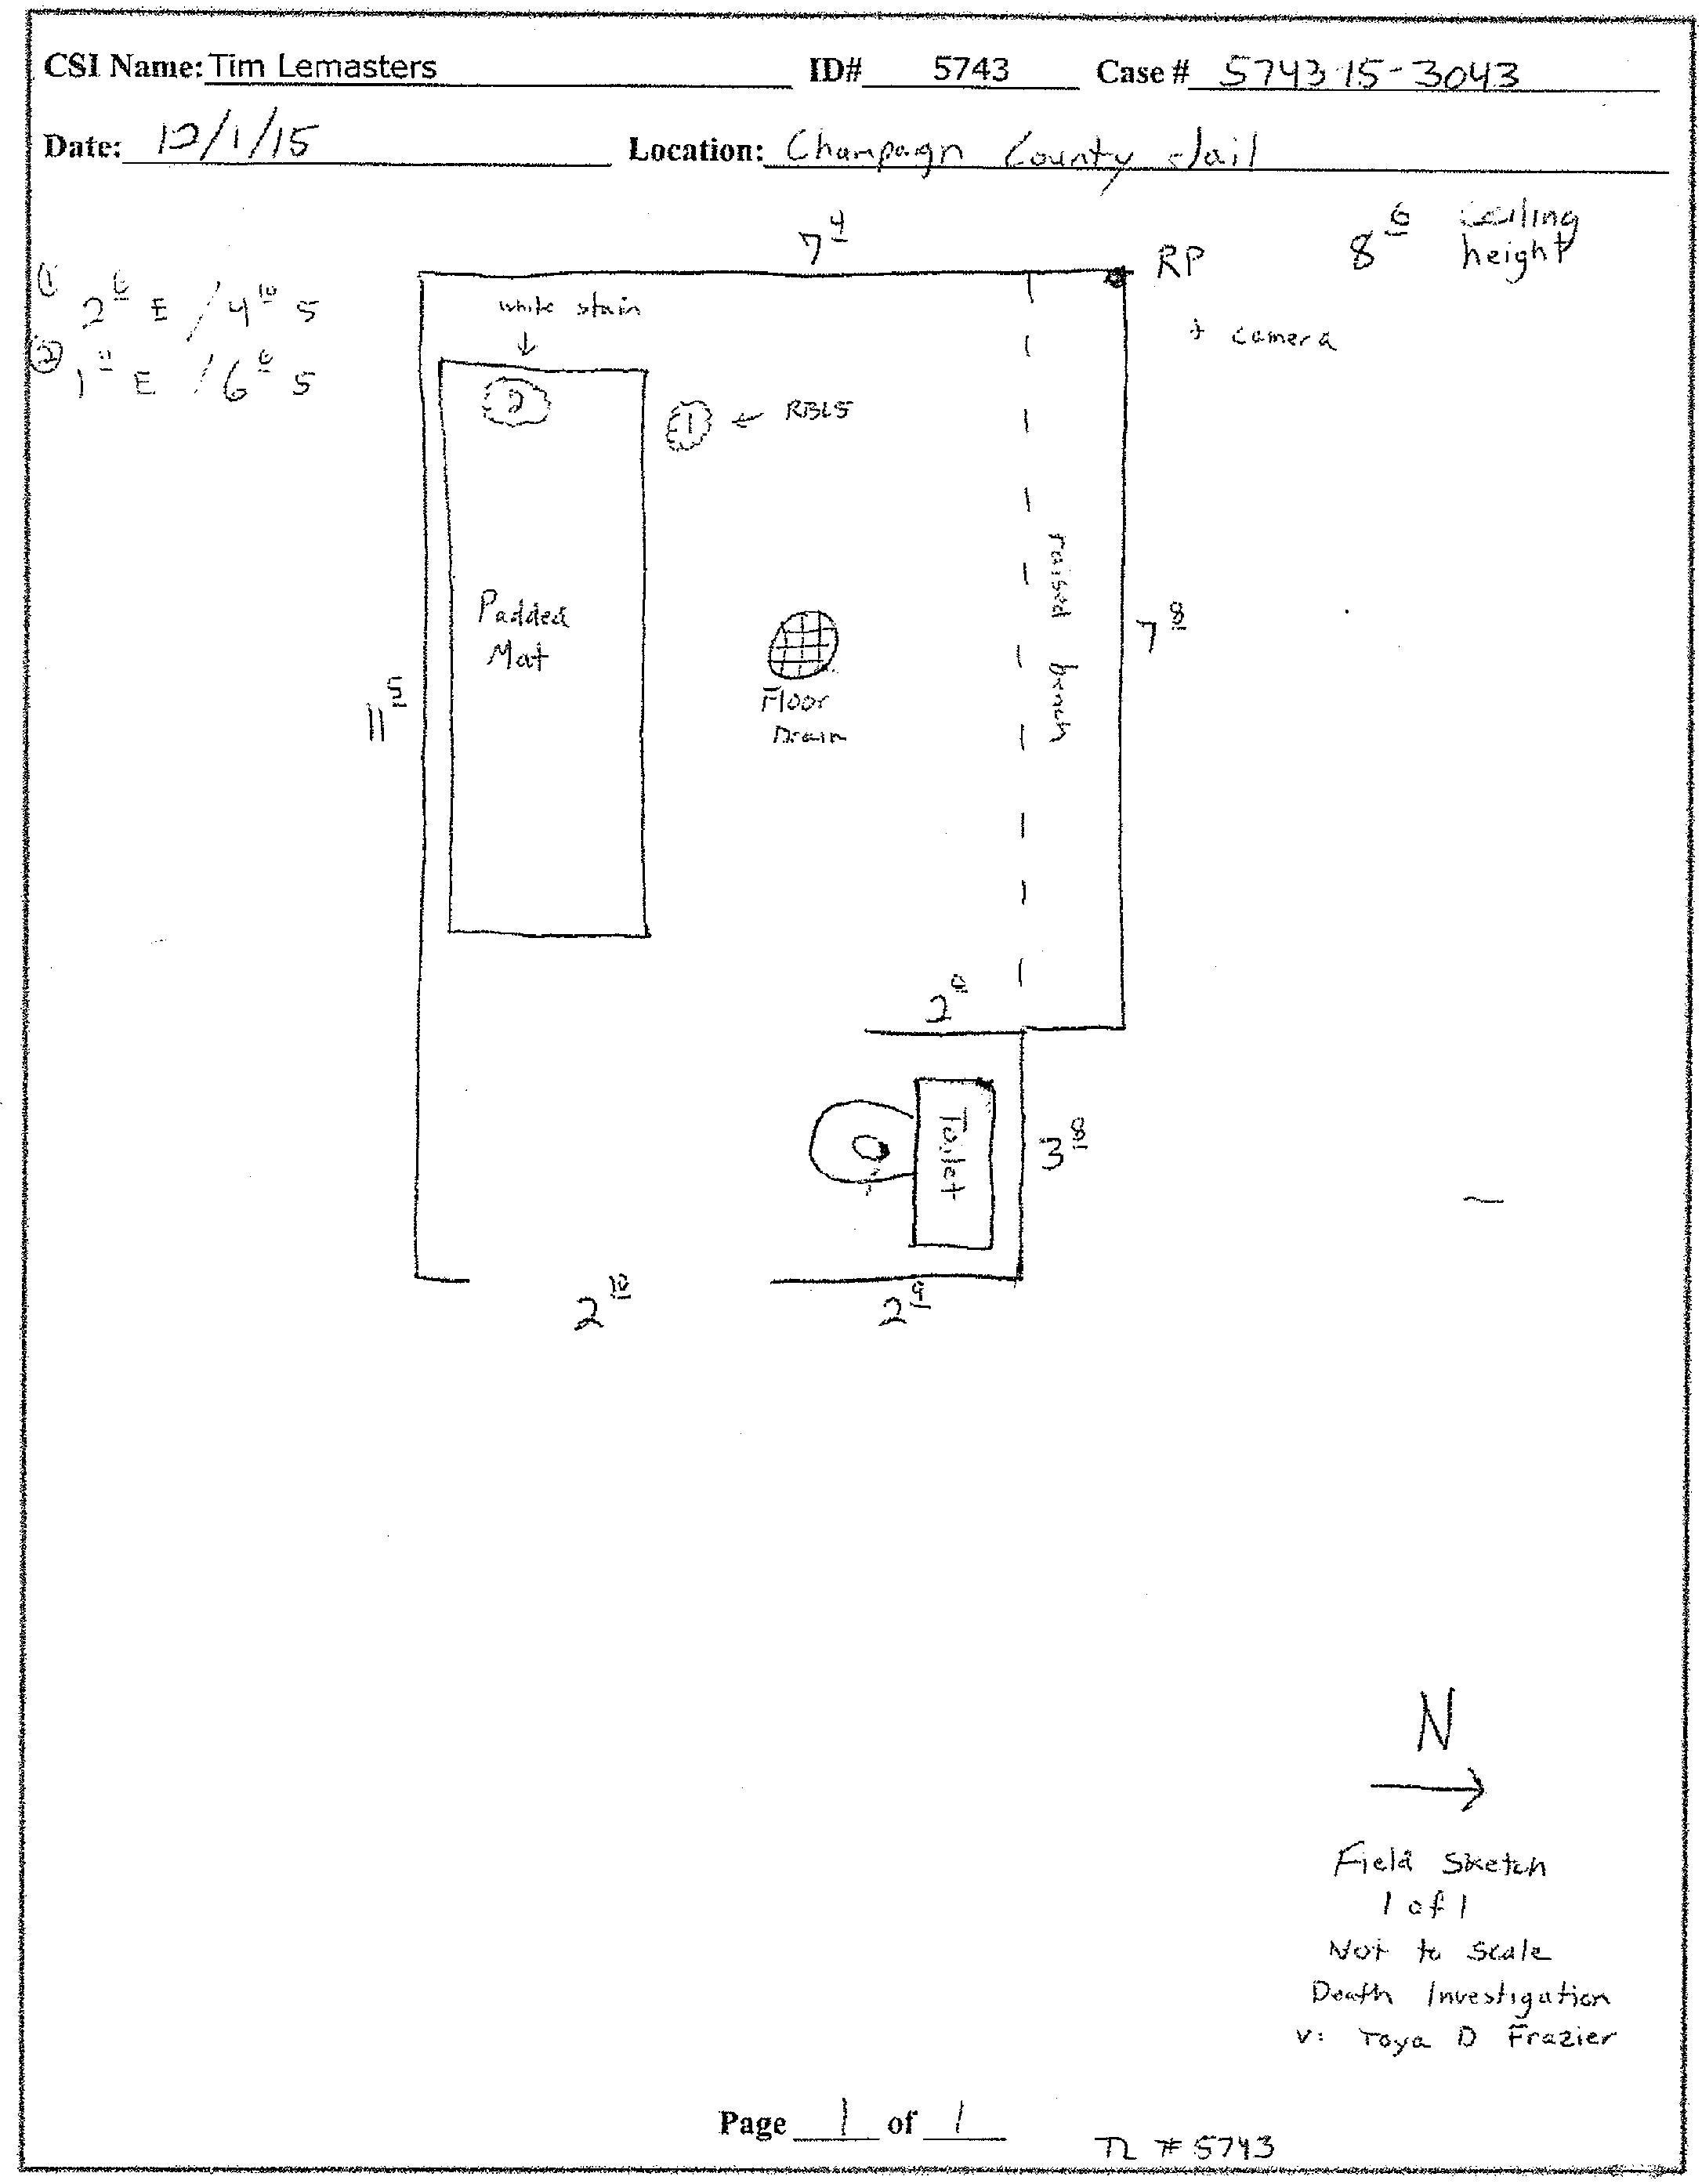 Toya Frazier cell